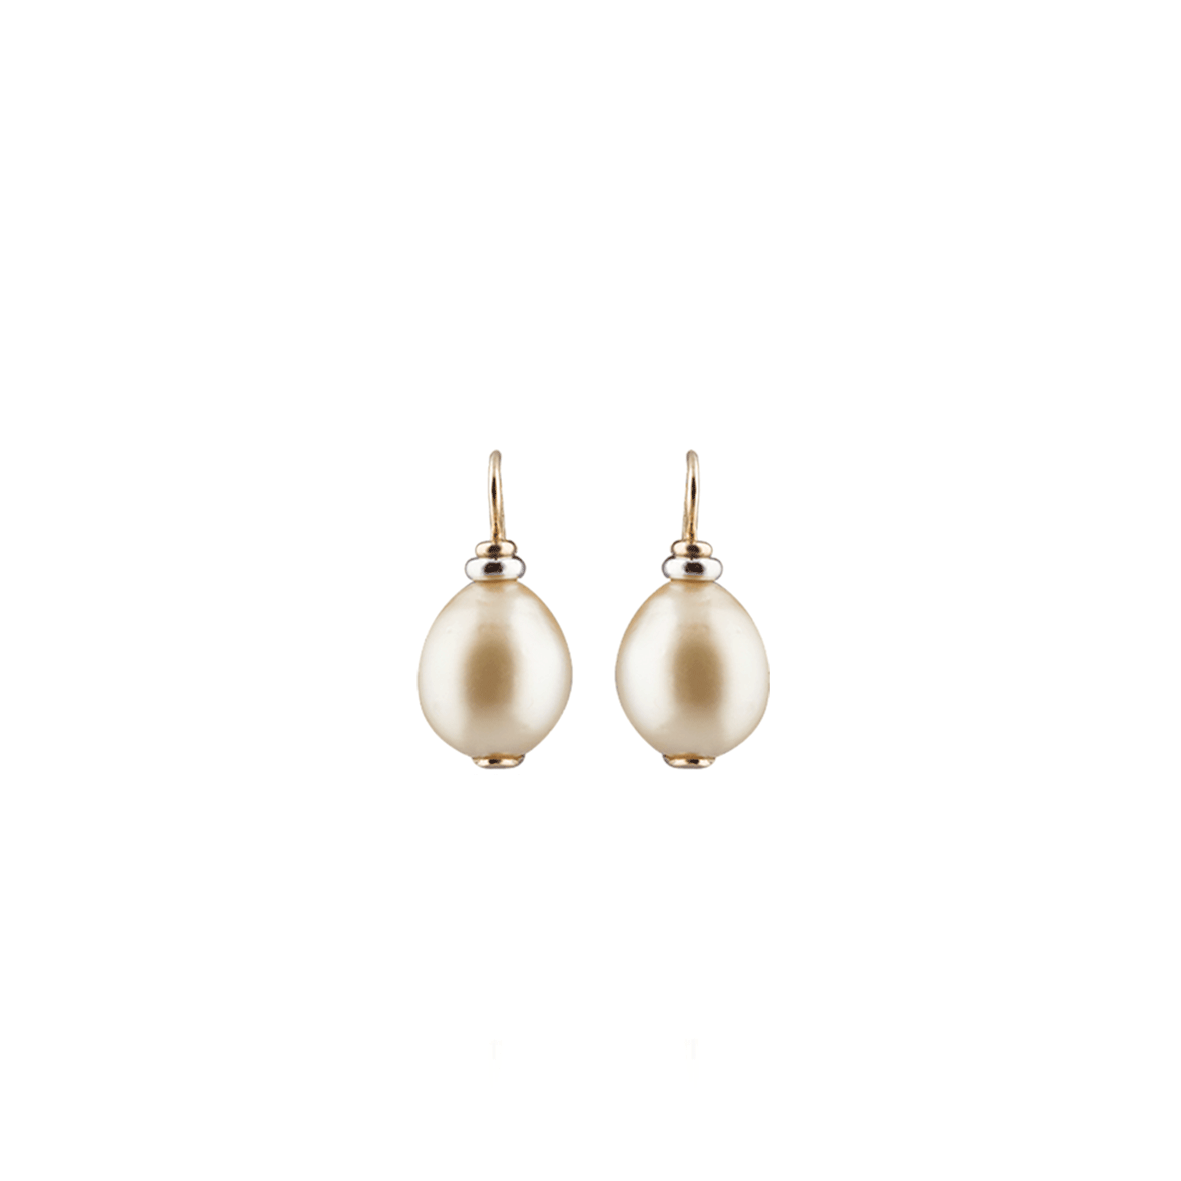 Silvia Kelly - Lecco jewelry - Italian jewelry - Gold Earrings